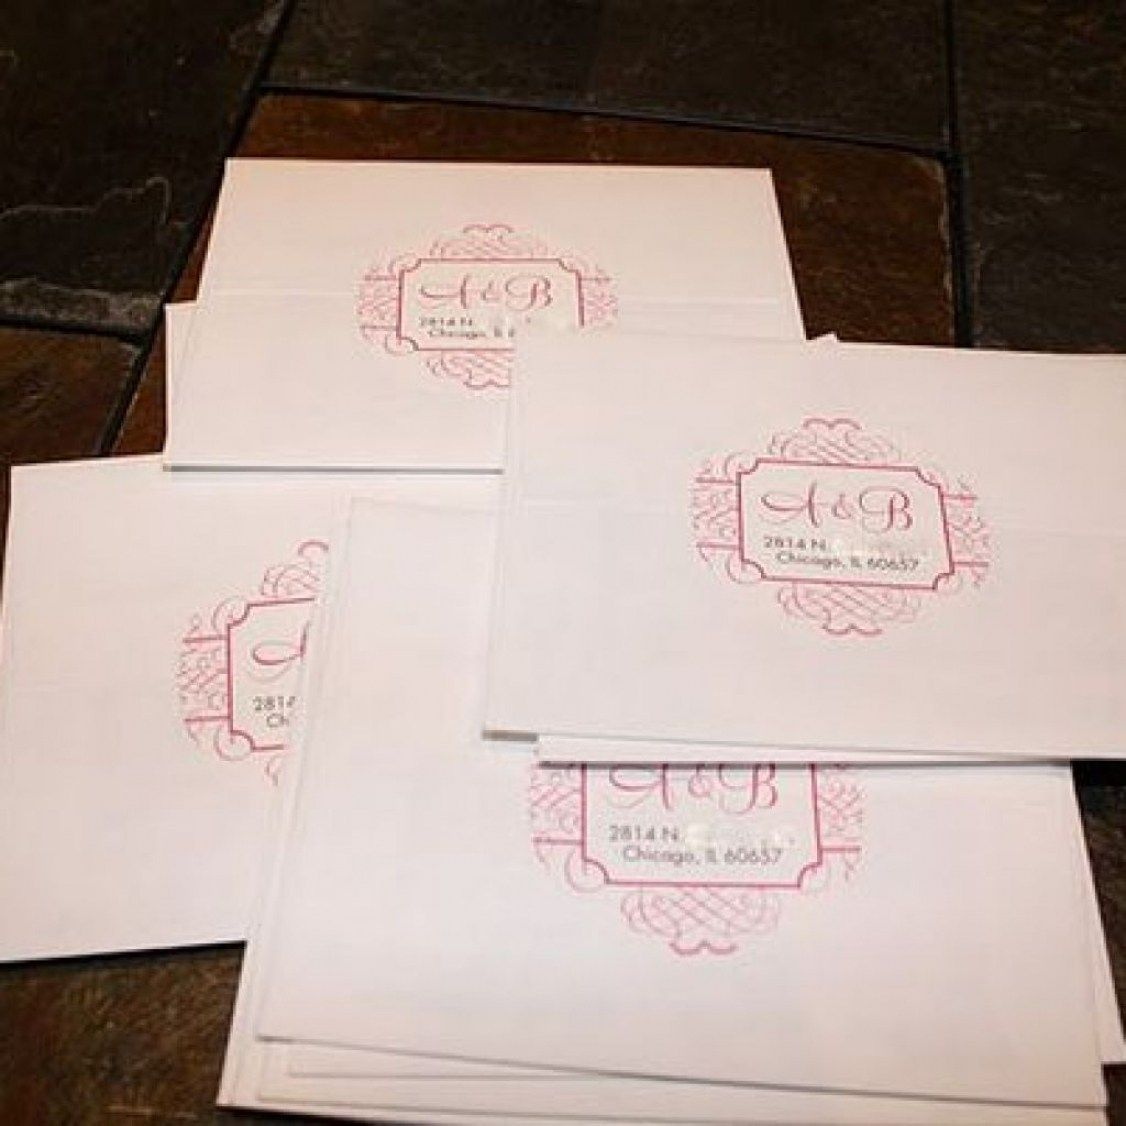 Return Labels For Wedding Invitations Sunshinebizsolutions Throughout Address Etiquette Invitation